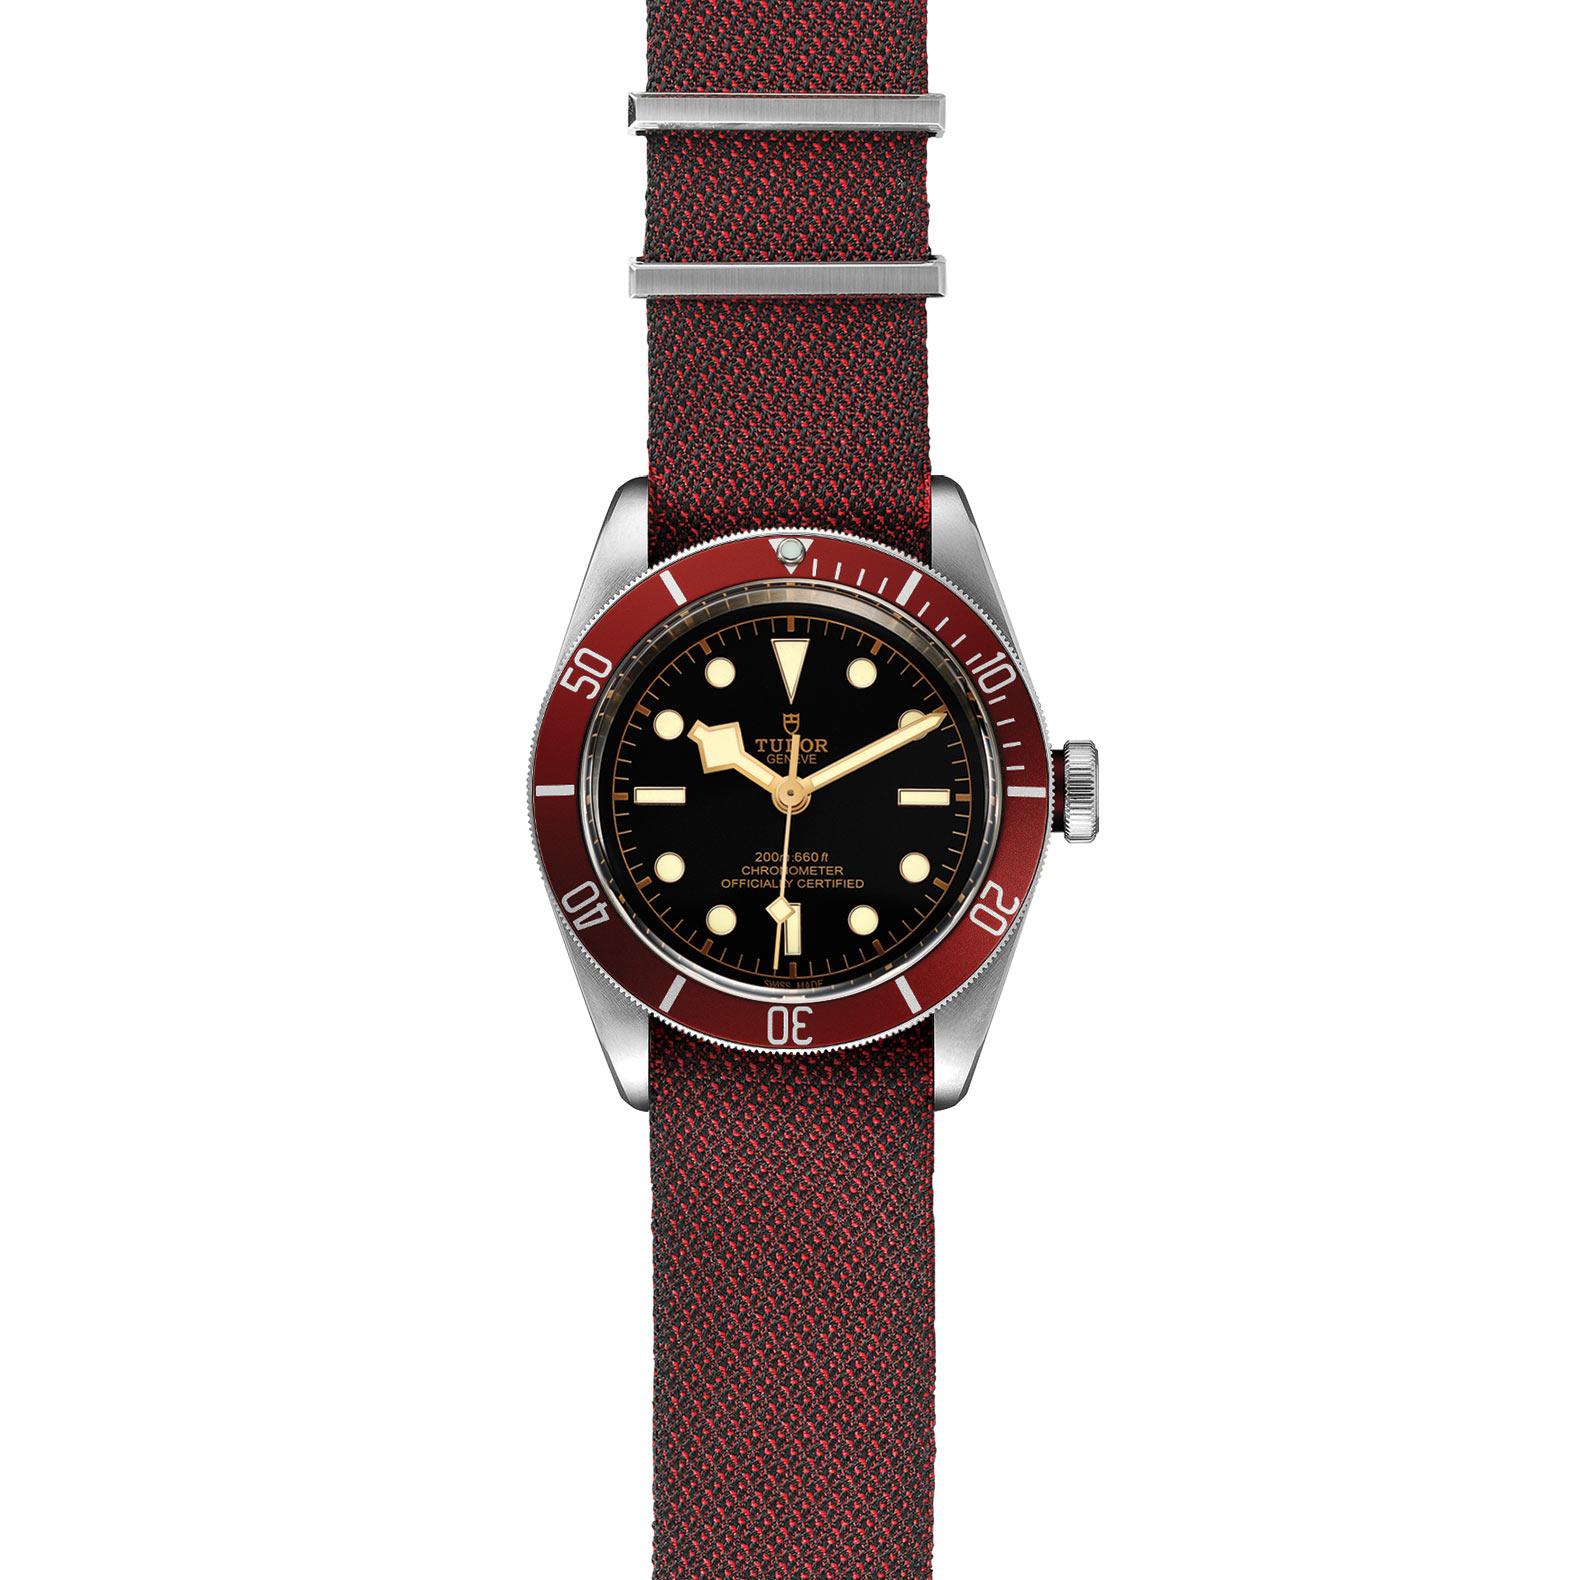 Tudor_M79230r-0009